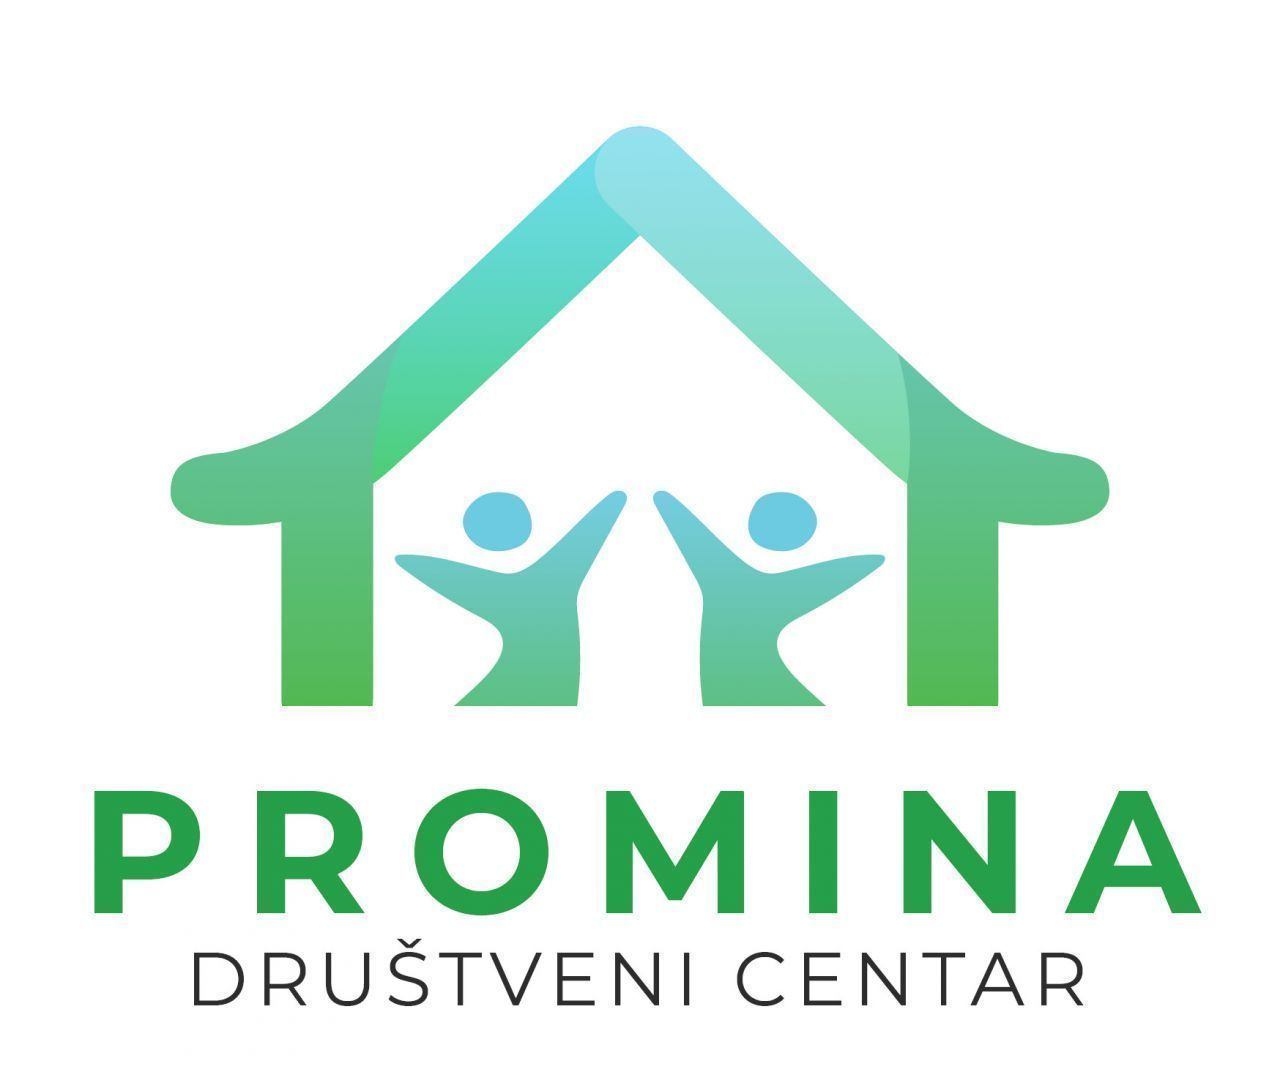 Društveni centar Promina - kalendar događanja za 09/2021.